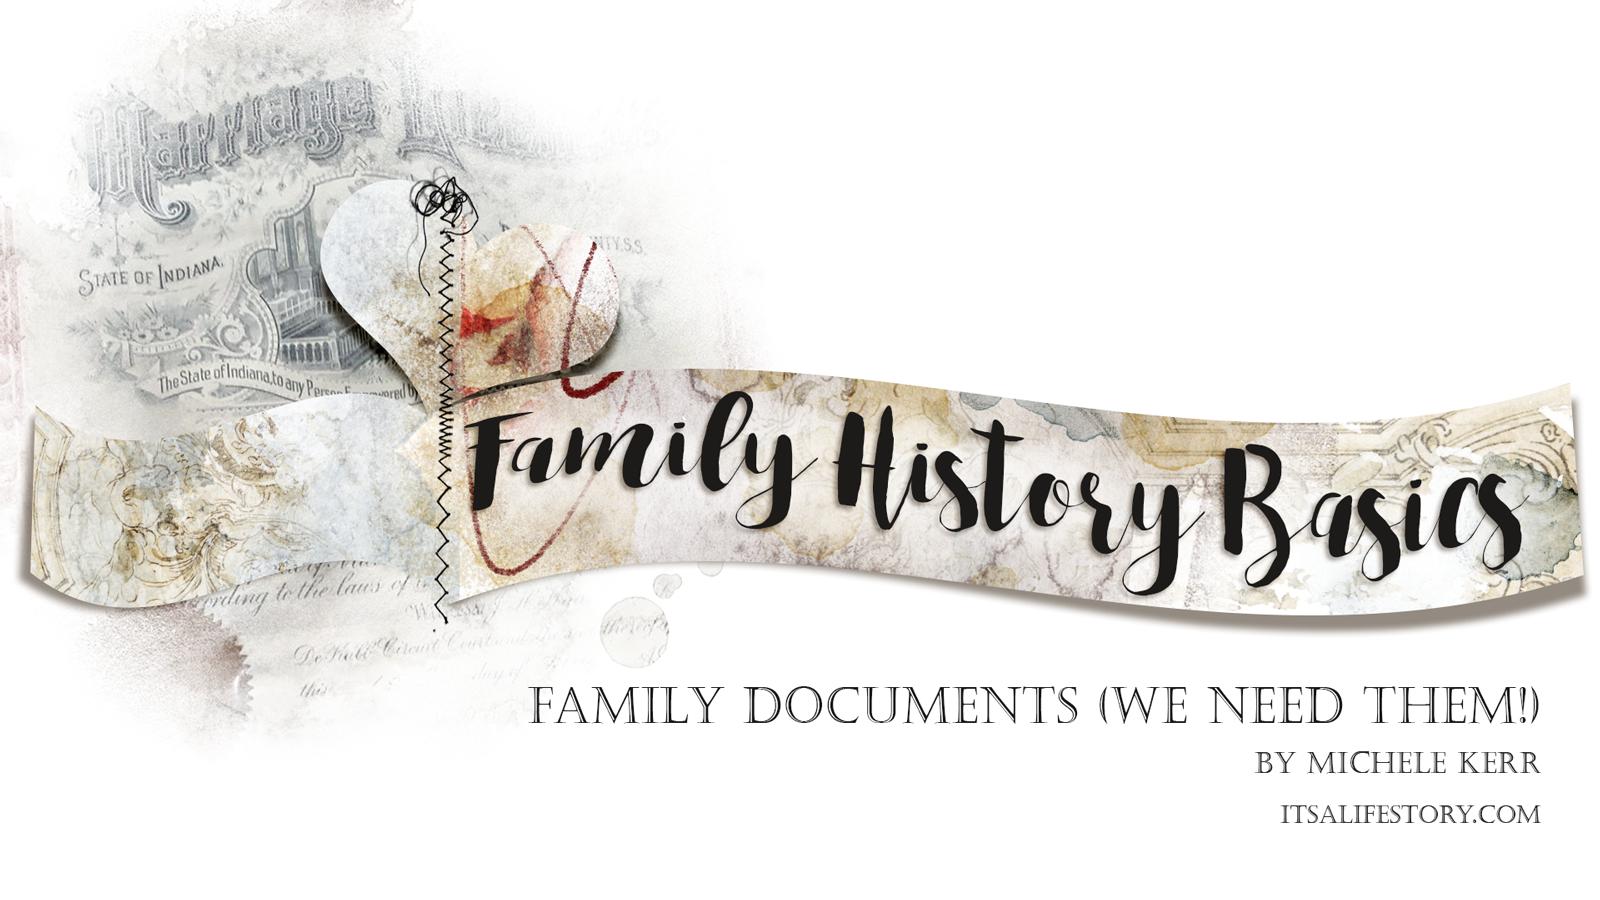 ItsALifeStory.com _ FAMILY HISTORY BASICS - Family Documents - We Need Them